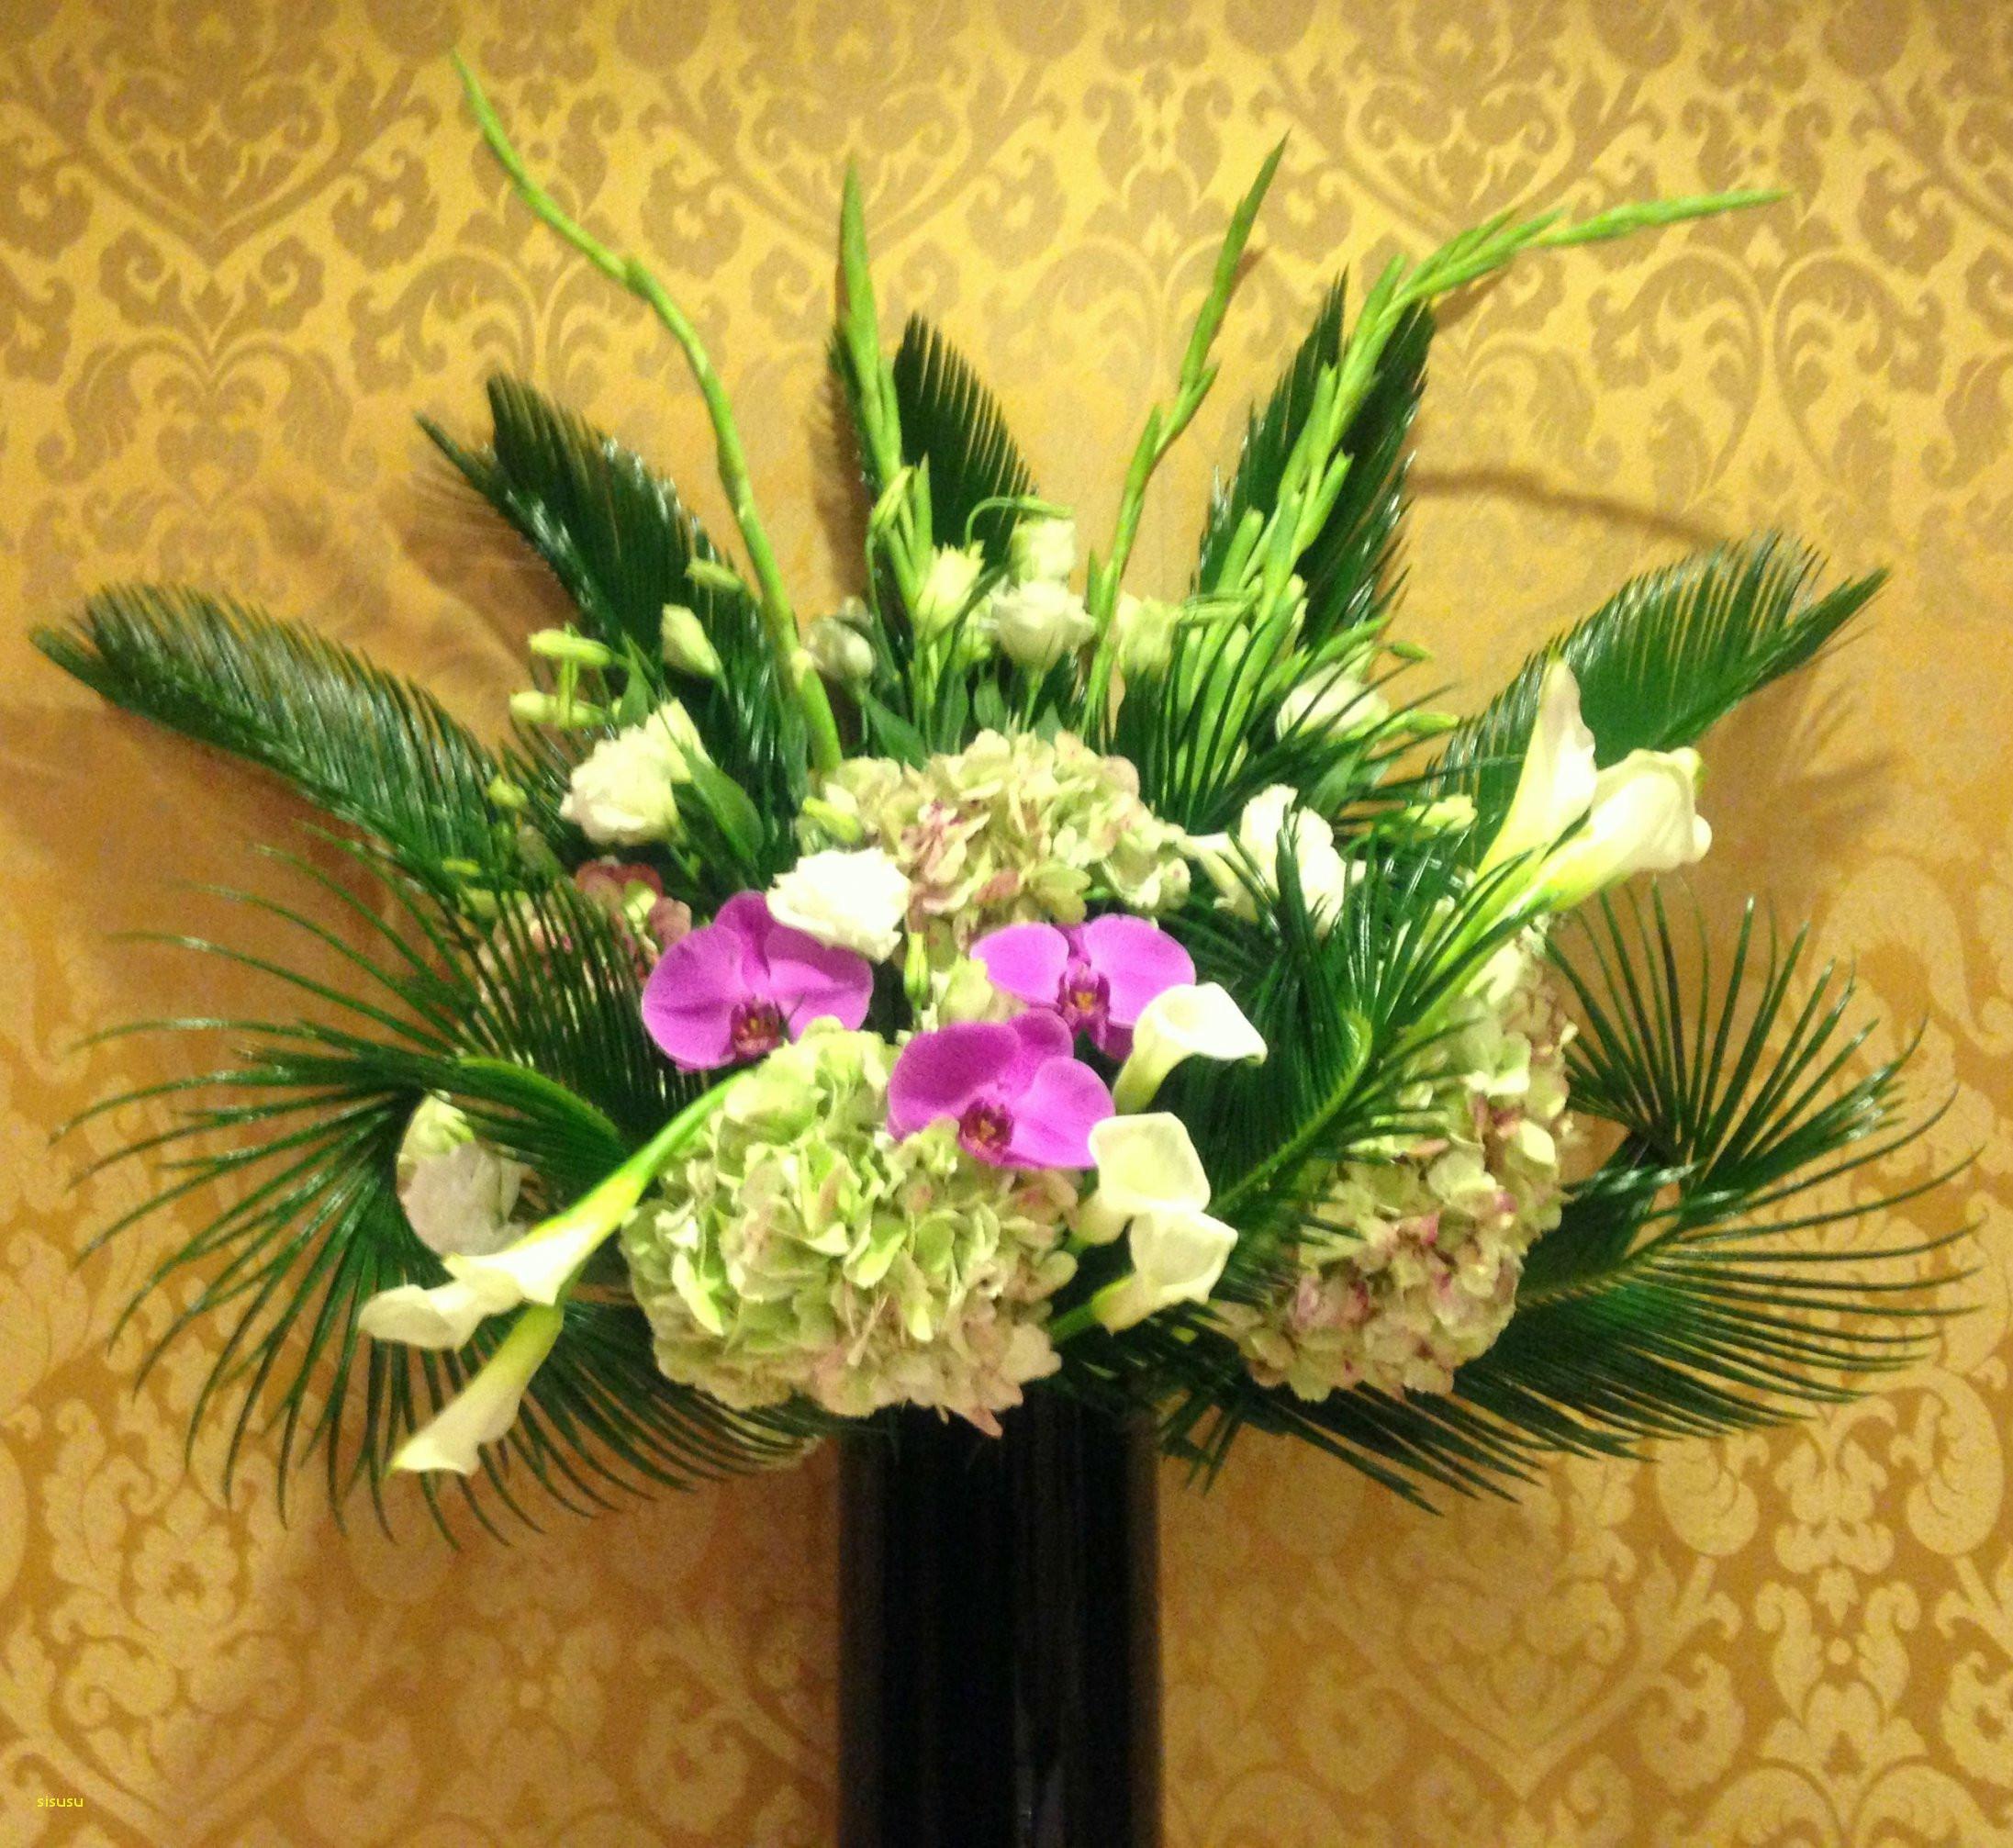 Hotel Lobby Flowers A tall arrangement of Hydrangeas White Callas and Gladiolas and fabulous Purple Phalaenopsis